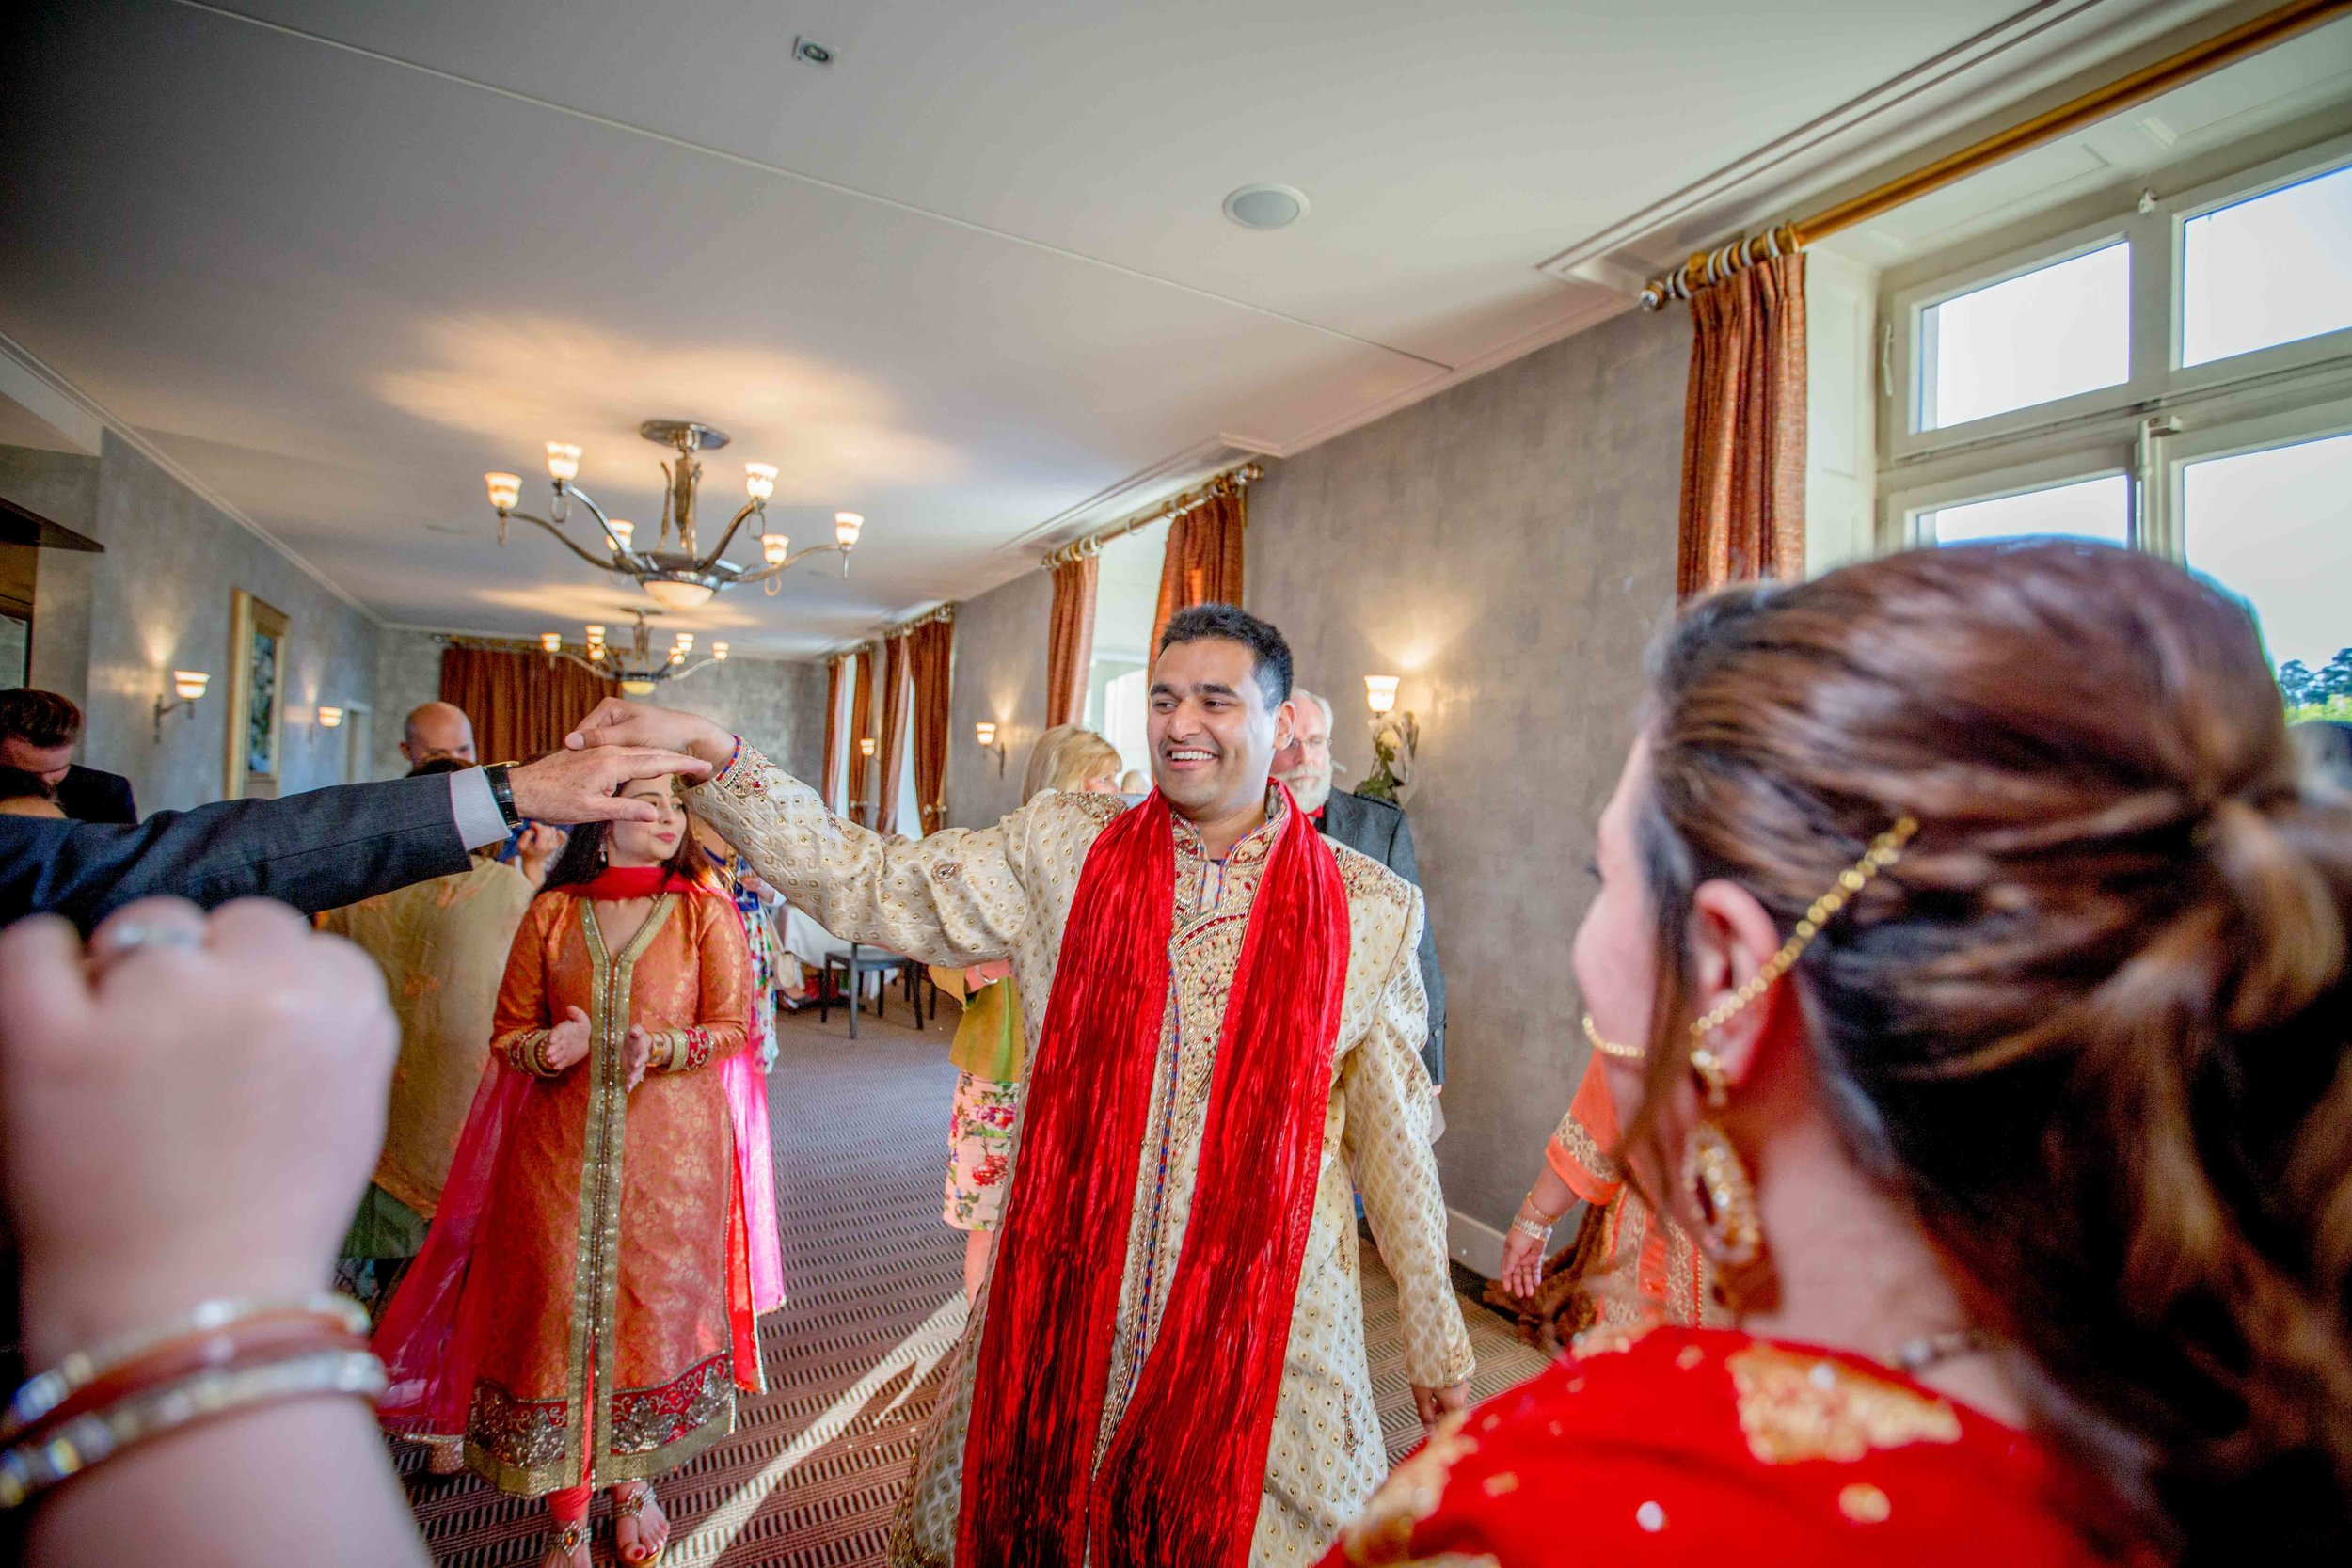 parc-des-eaux-vives-destination-wedding-photographer-geneva-switzerland-natalia-smith-photography-55.jpg